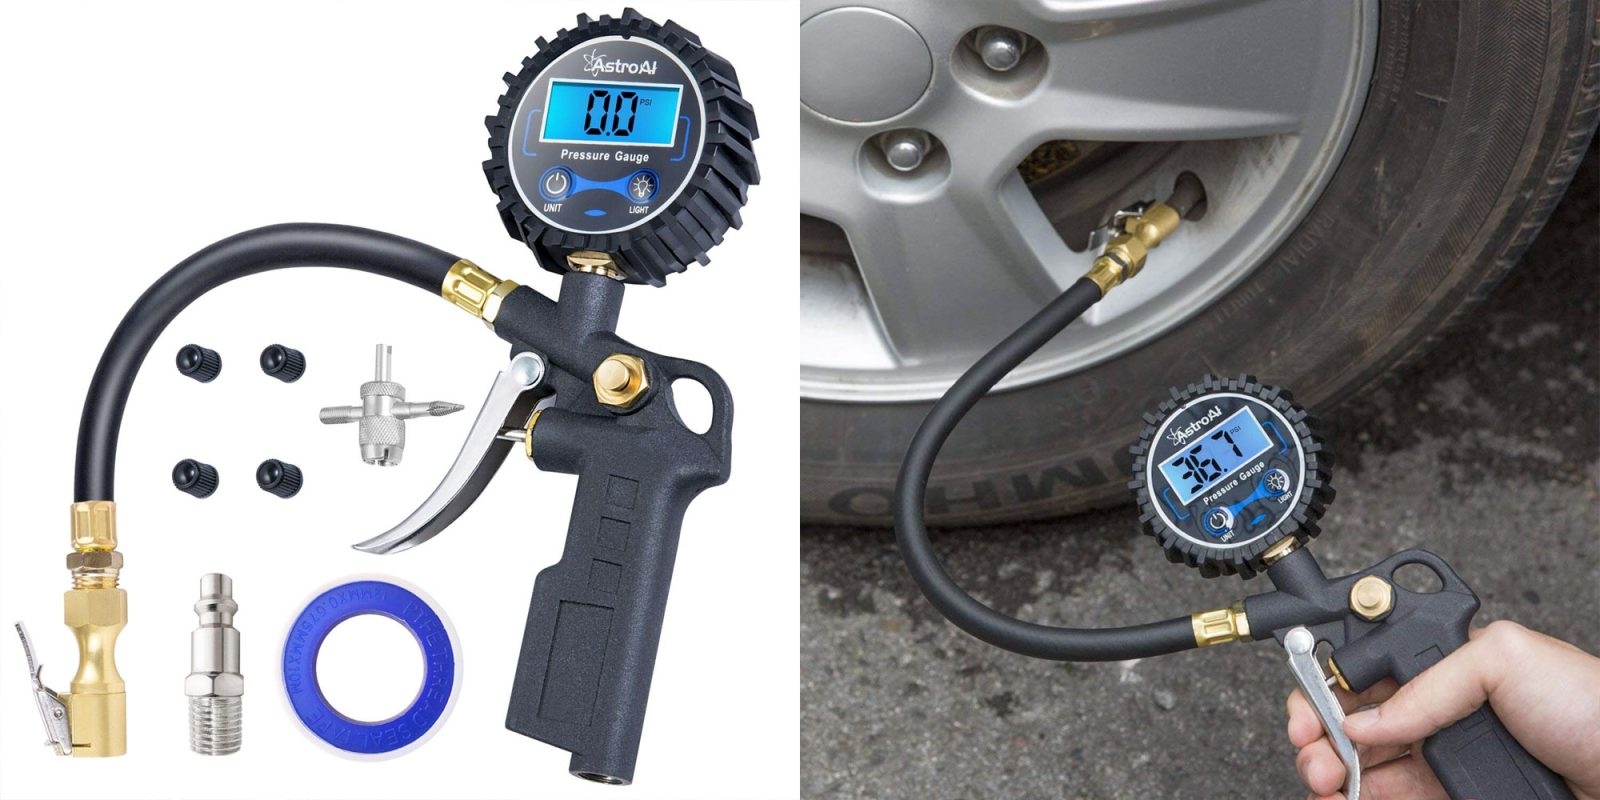 AstroAI's digital tire inflator + gauge is now $14 Prime shipped (Reg. $20)